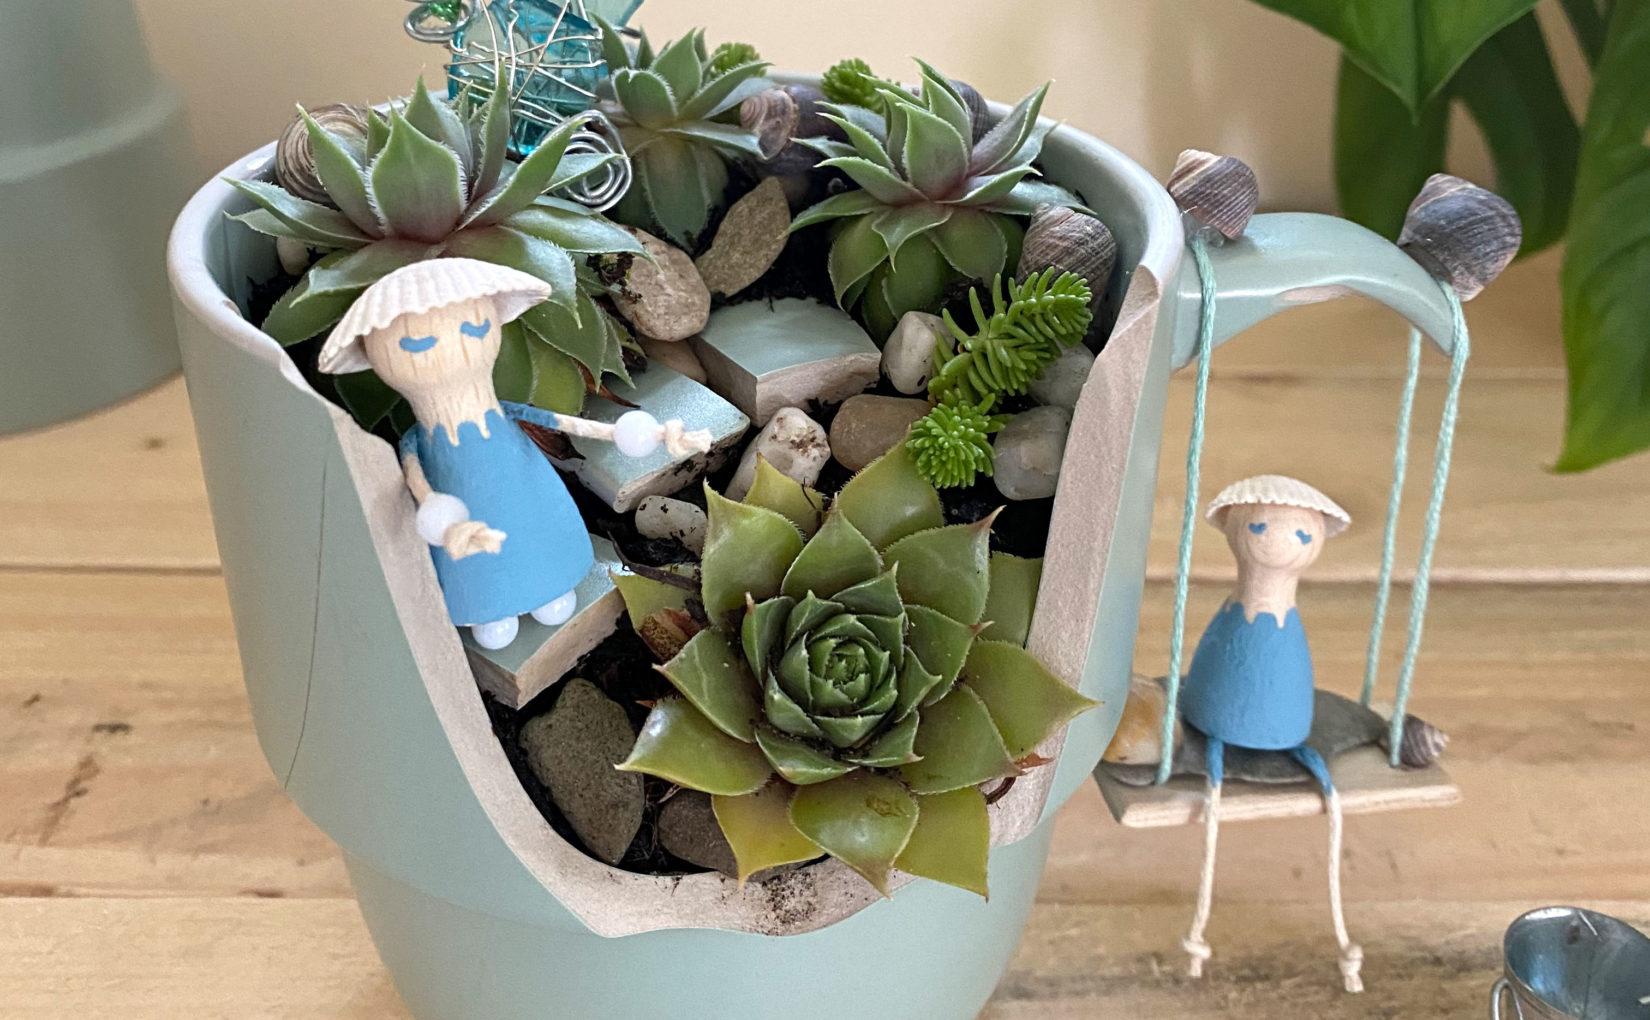 Tassengarten – Miniature Gardening